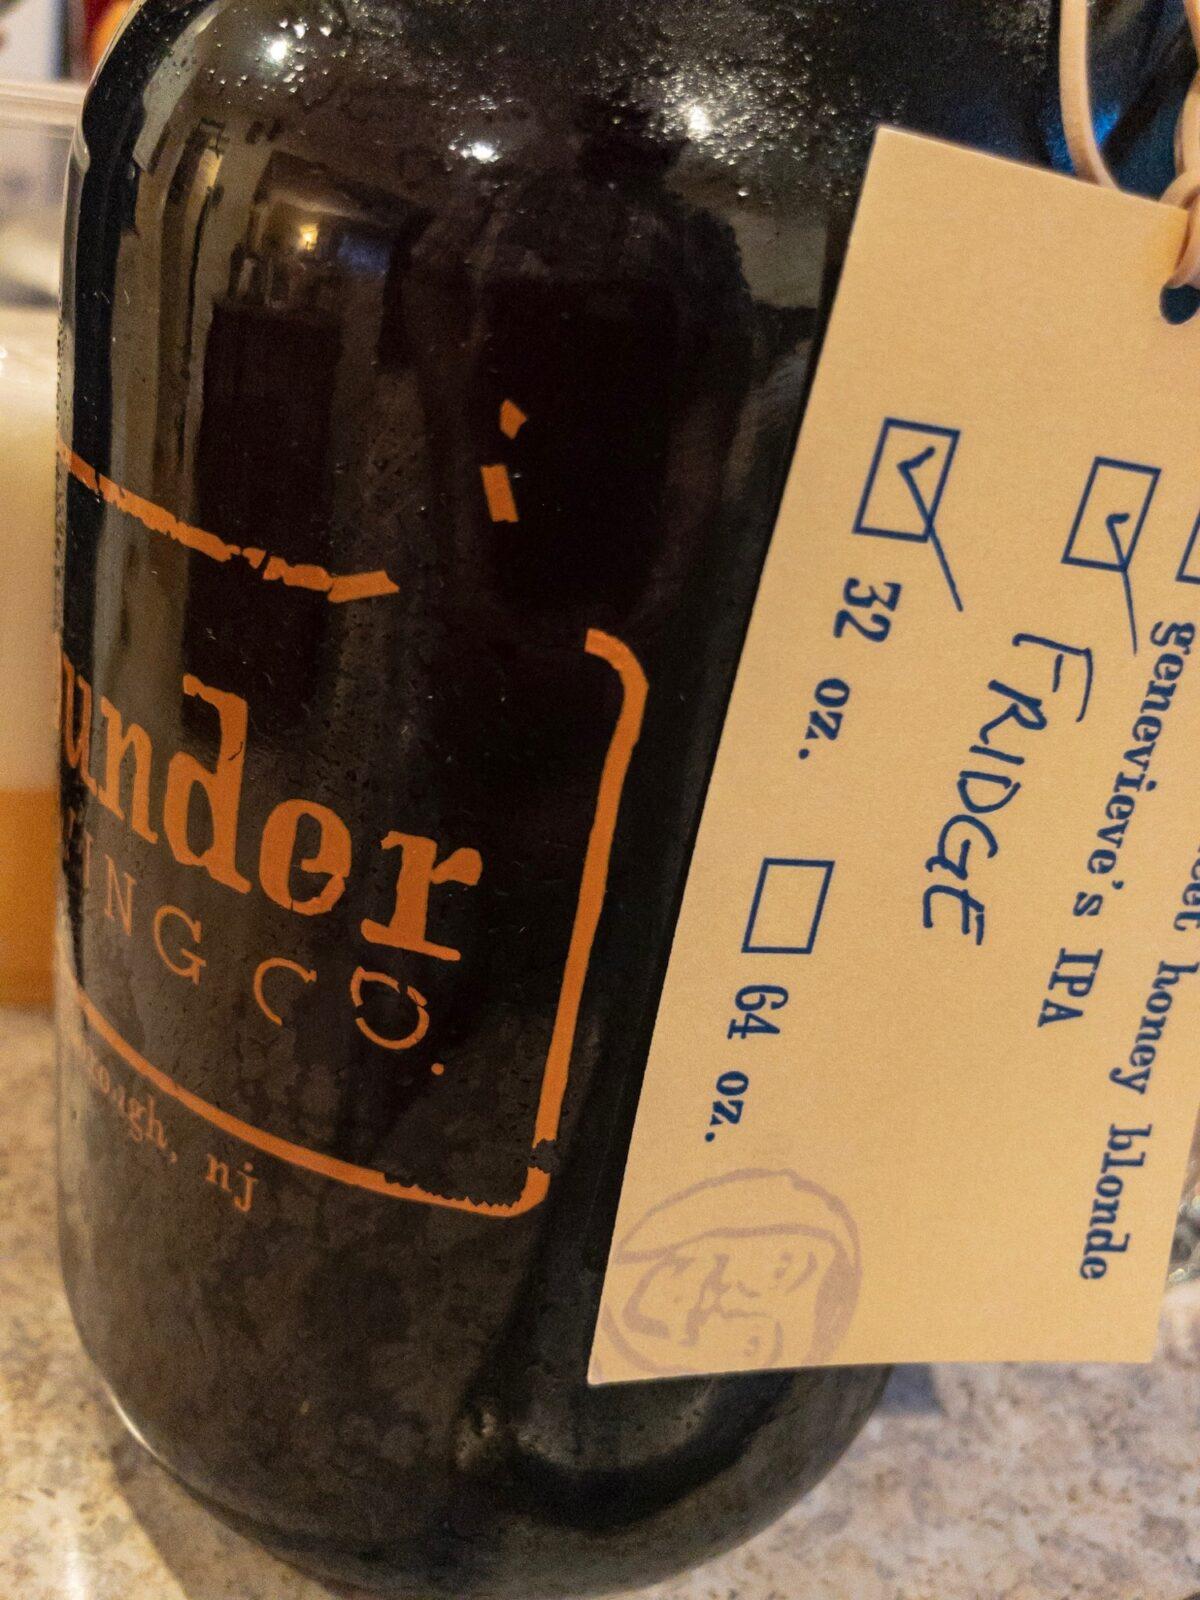 Flounder Brewing Co's Fridge